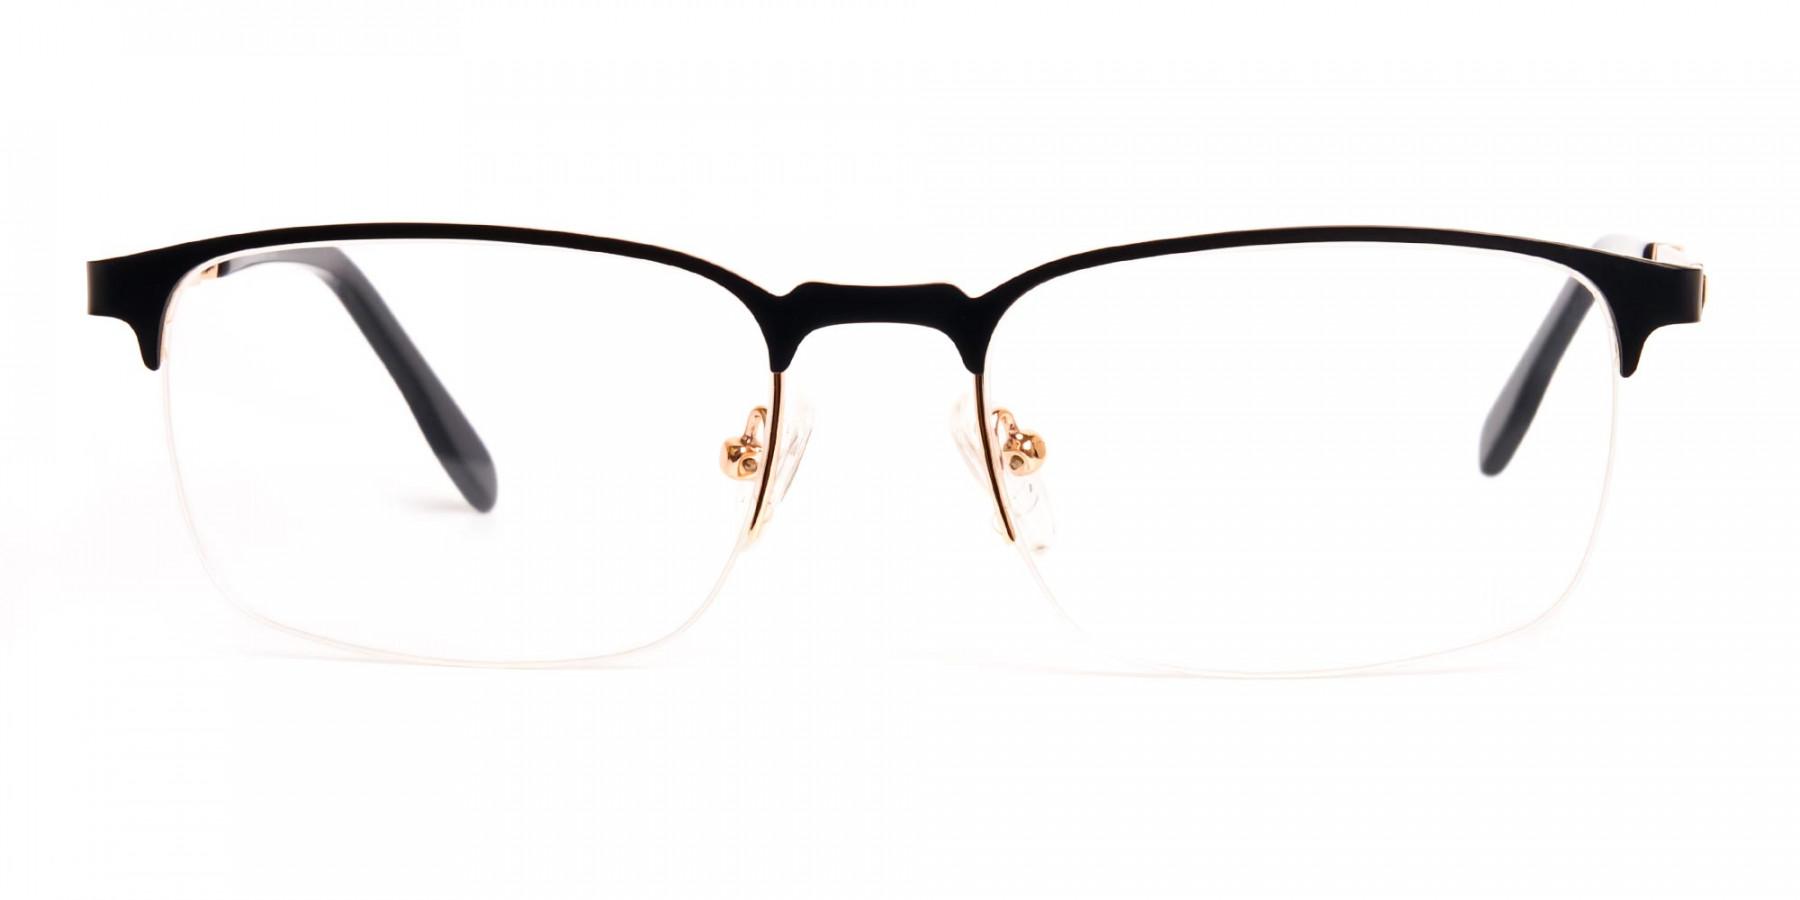 black-and-gold-rectangular-half-rim-glasses-frames-1